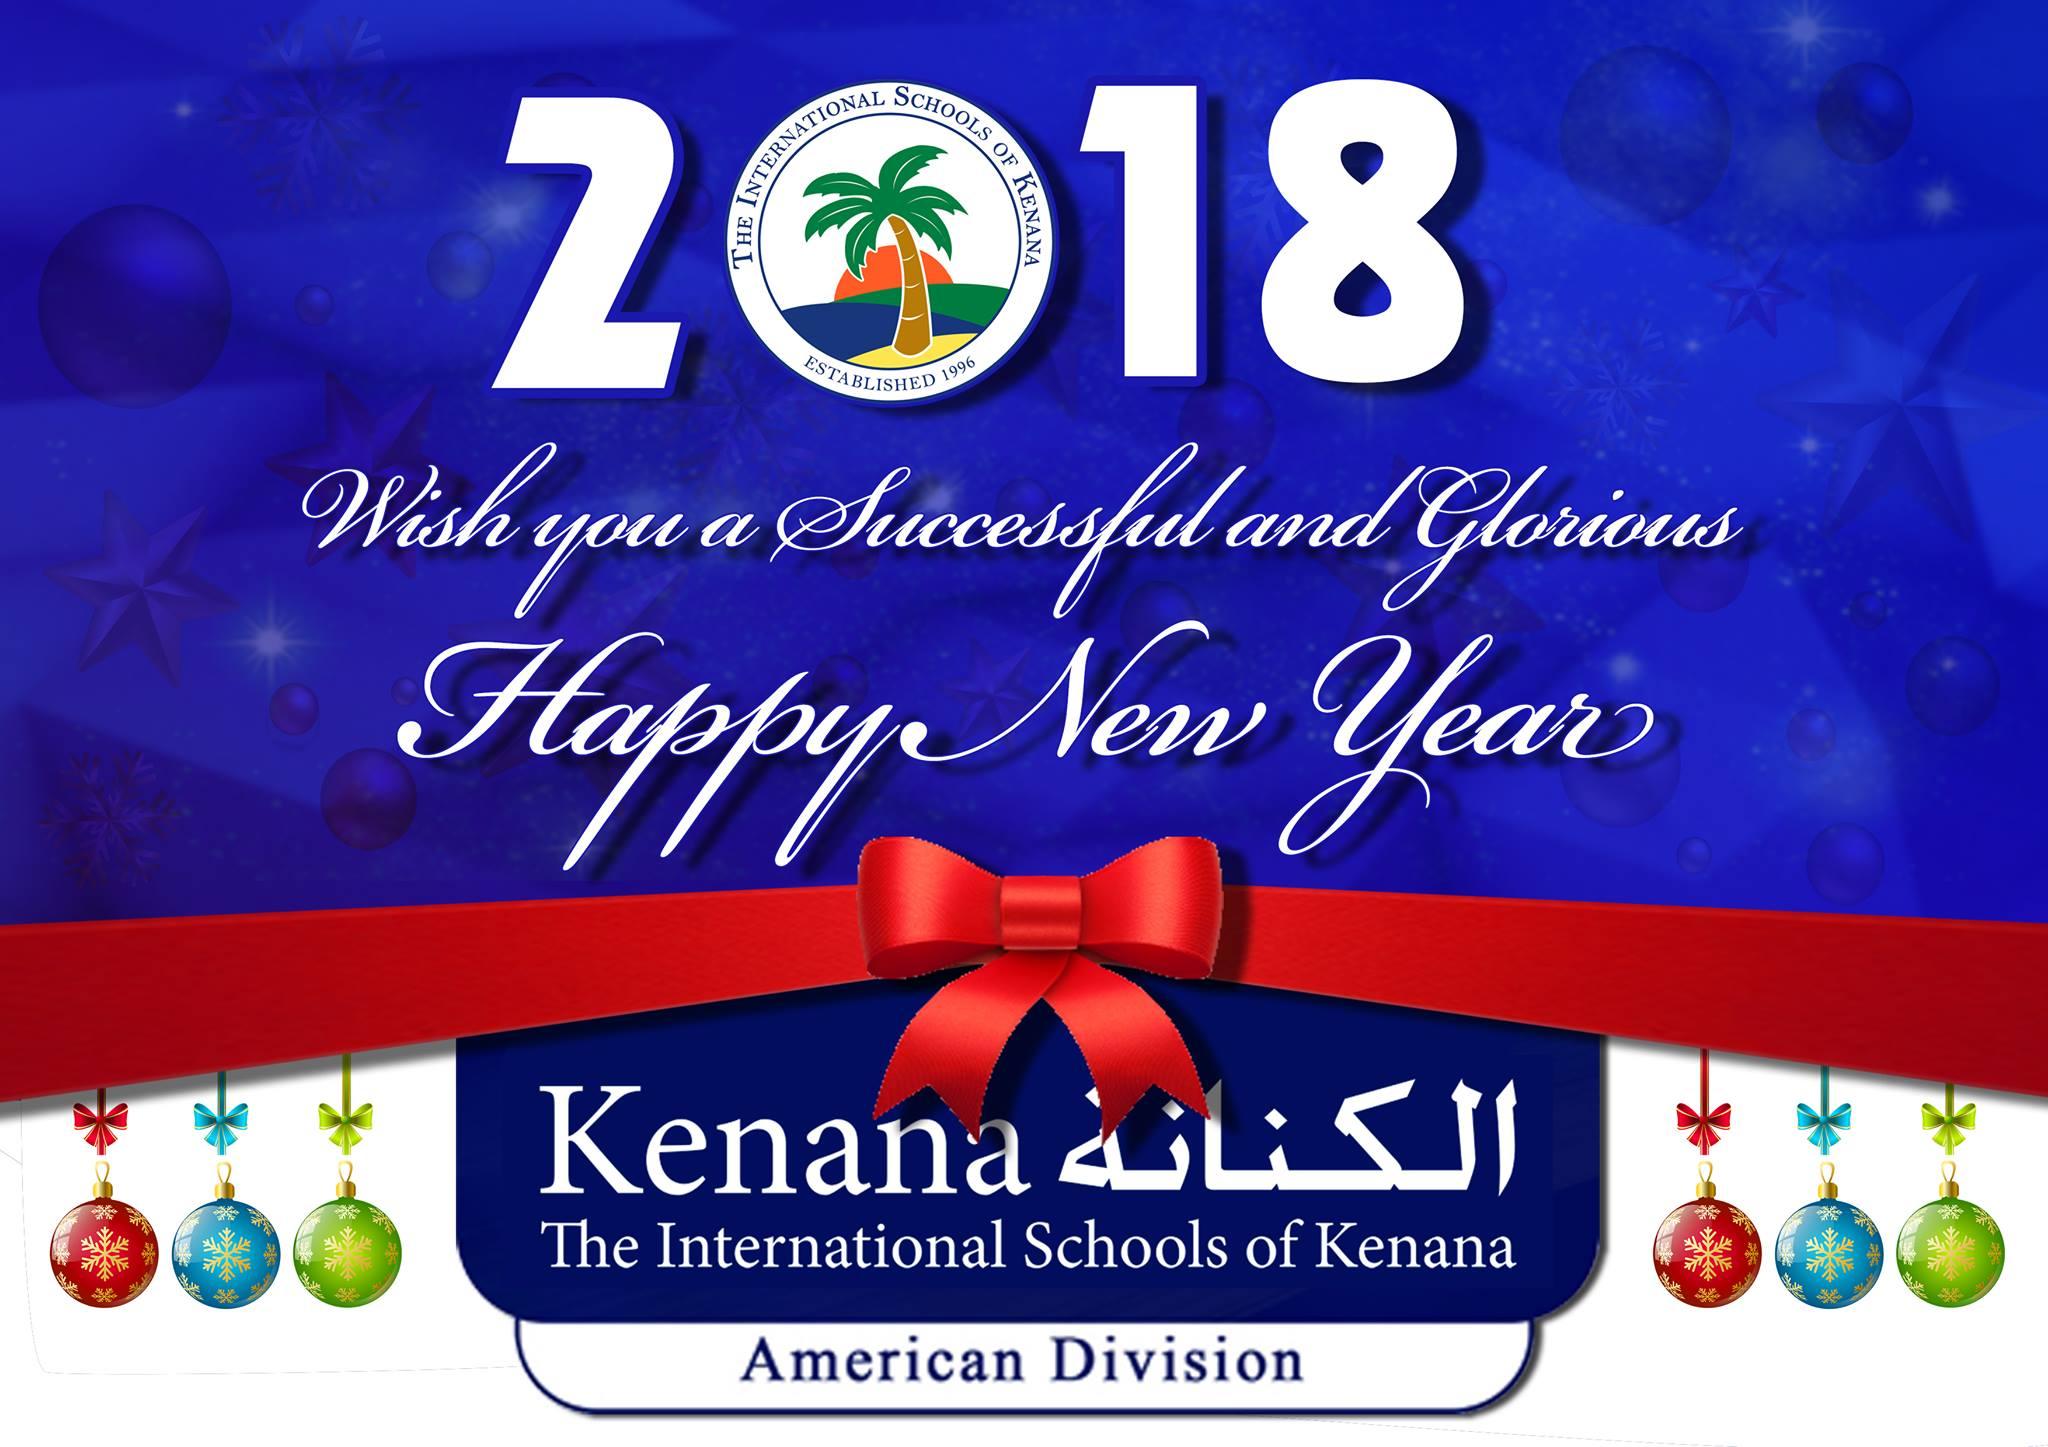 International Schools of kenana | American Division - Happy New Year 2018